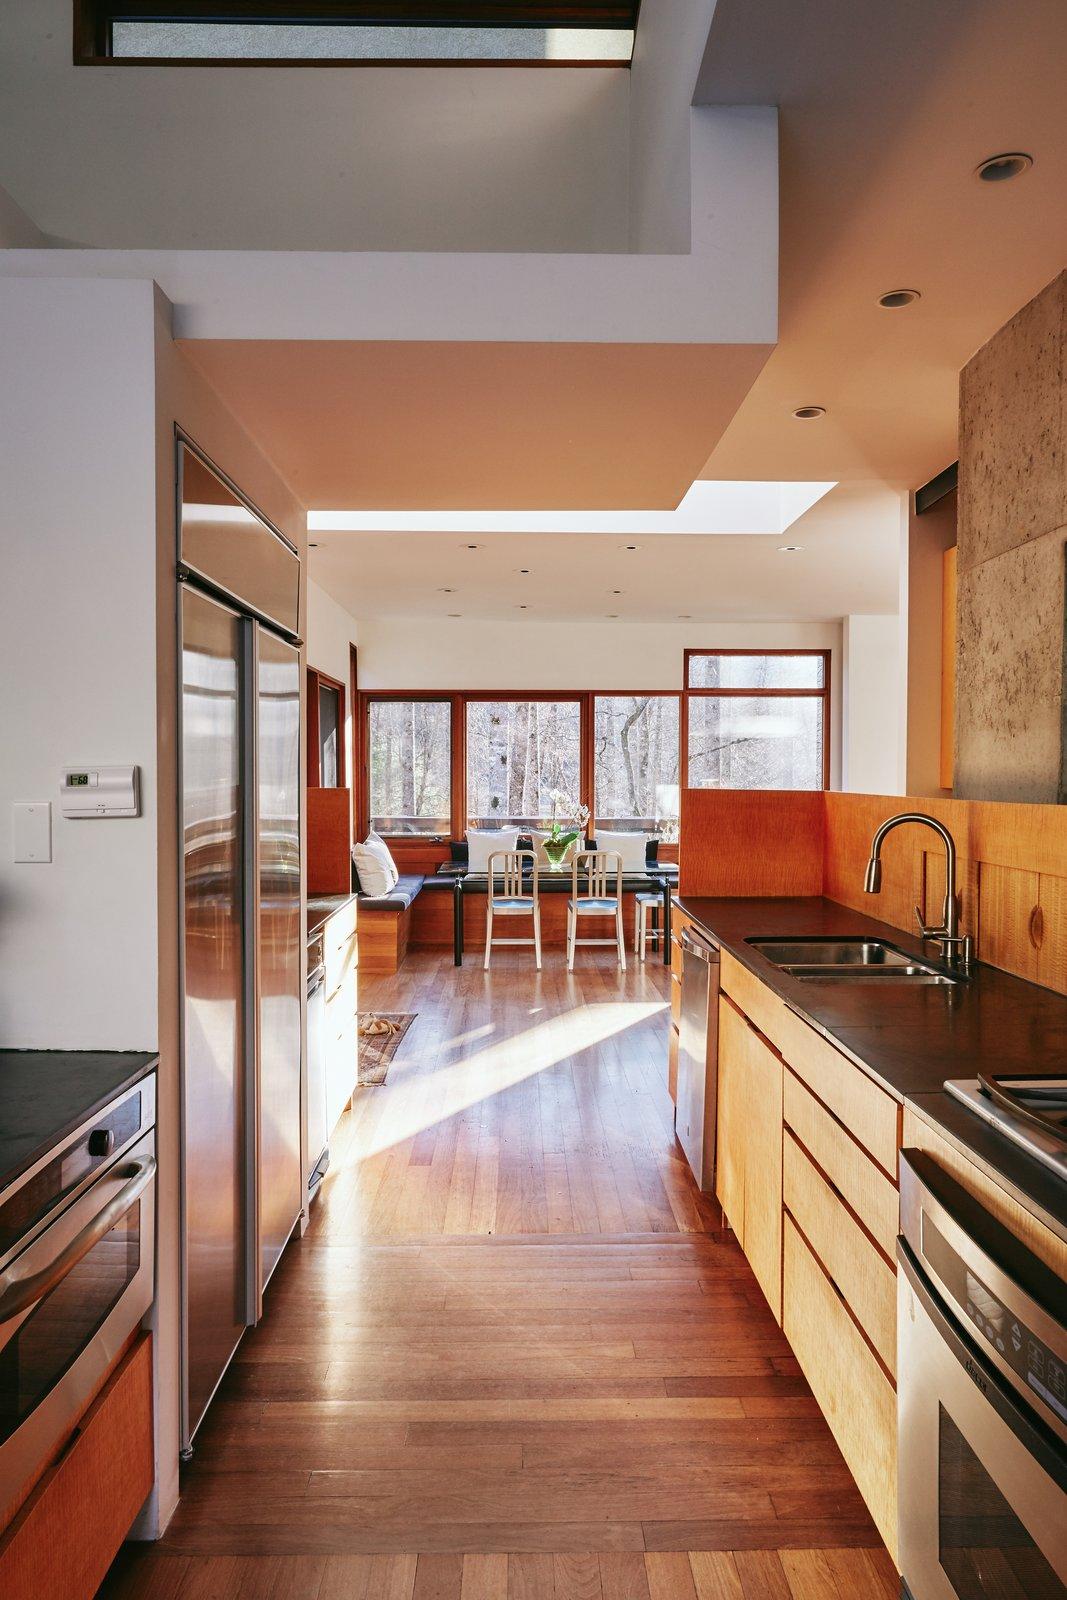 Kitchen, Wood Cabinet, Medium Hardwood Floor, Refrigerator, Undermount Sink, Stone Counter, Recessed Lighting, and Ceiling Lighting 'Mountain House' - Kitchen Natural Light  Mountain House Modern